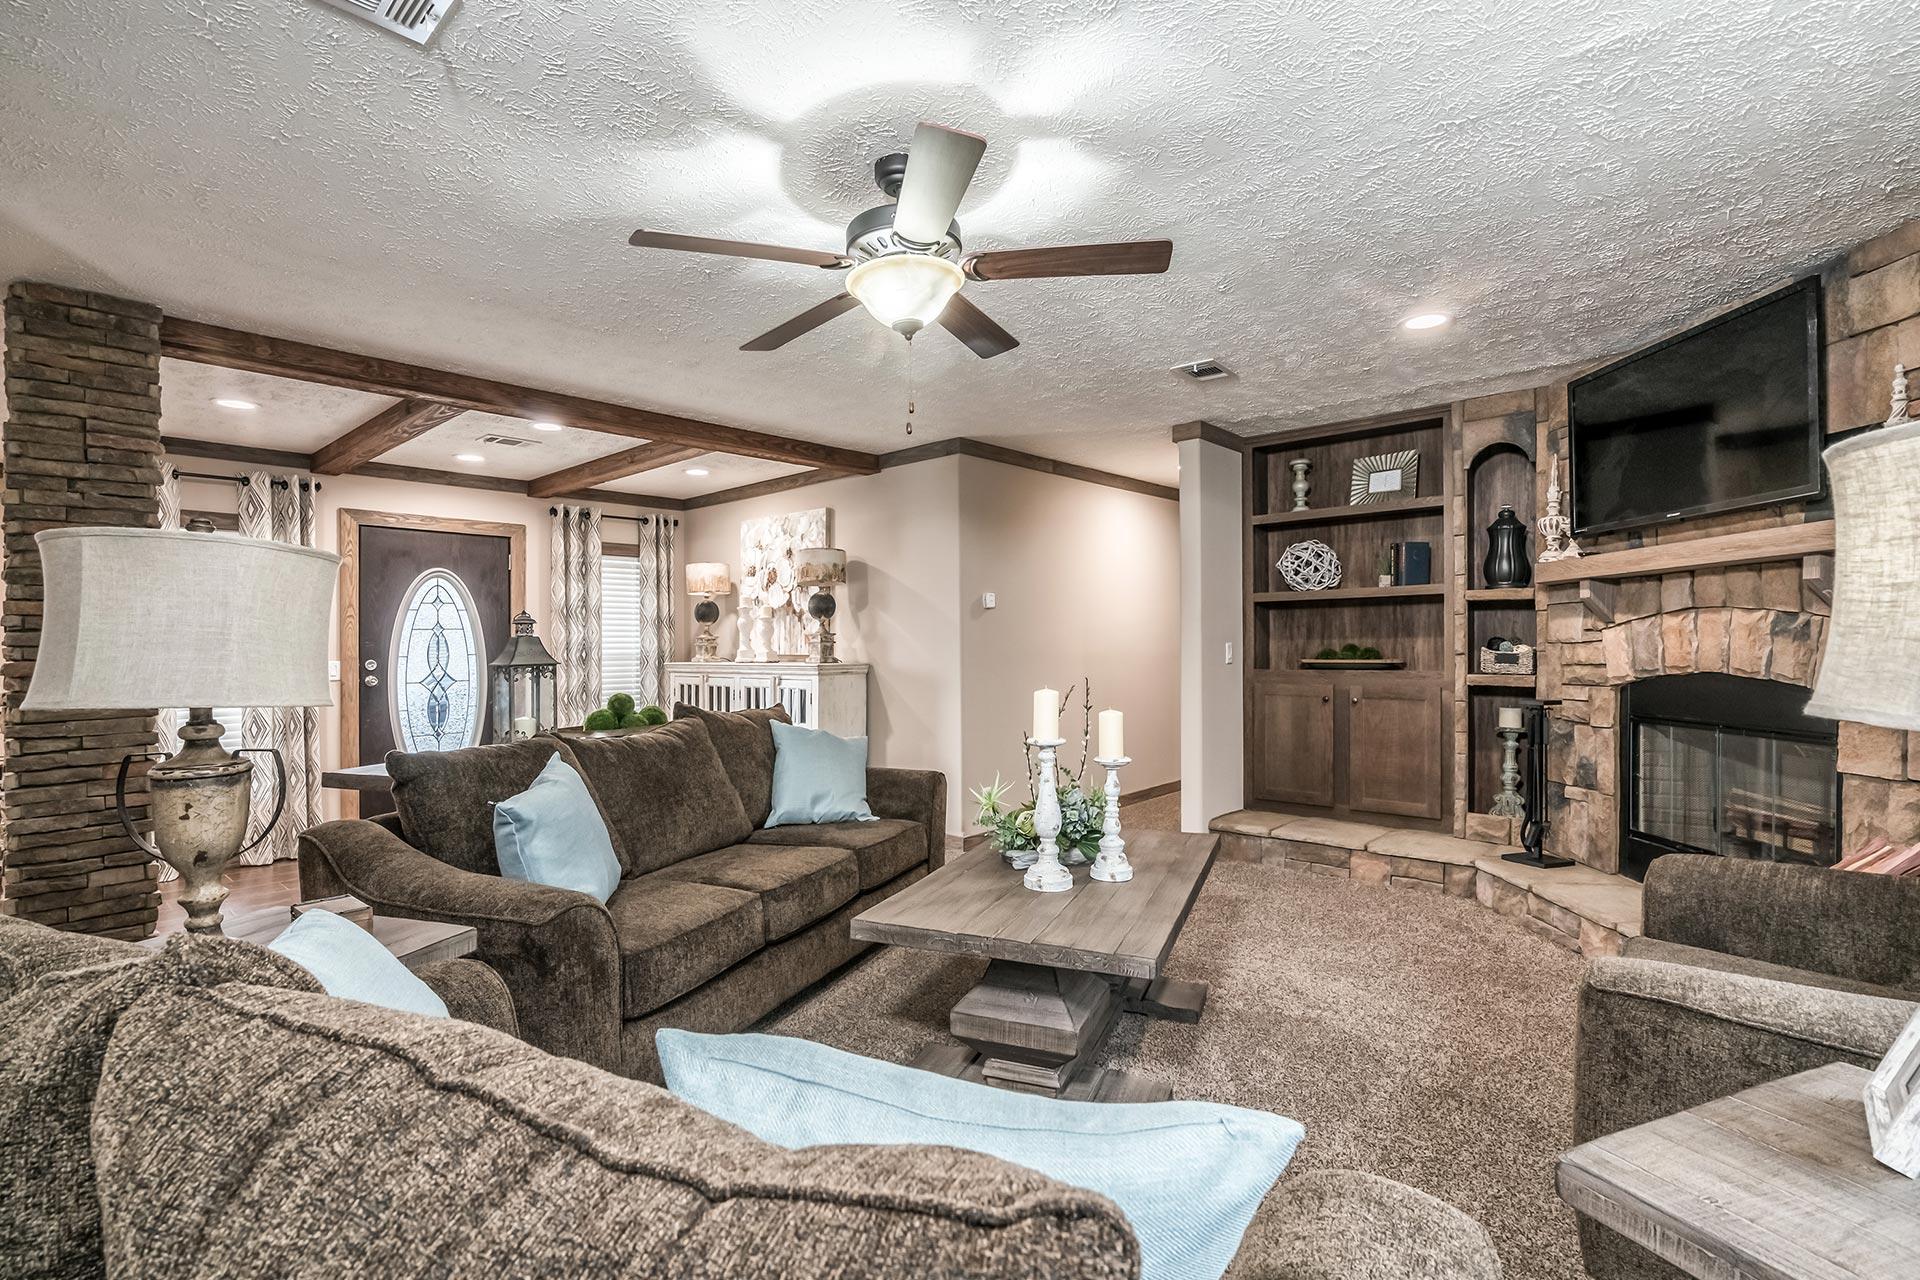 Bolton Homes in Alexandria, LA - Manufactured Home Dealer